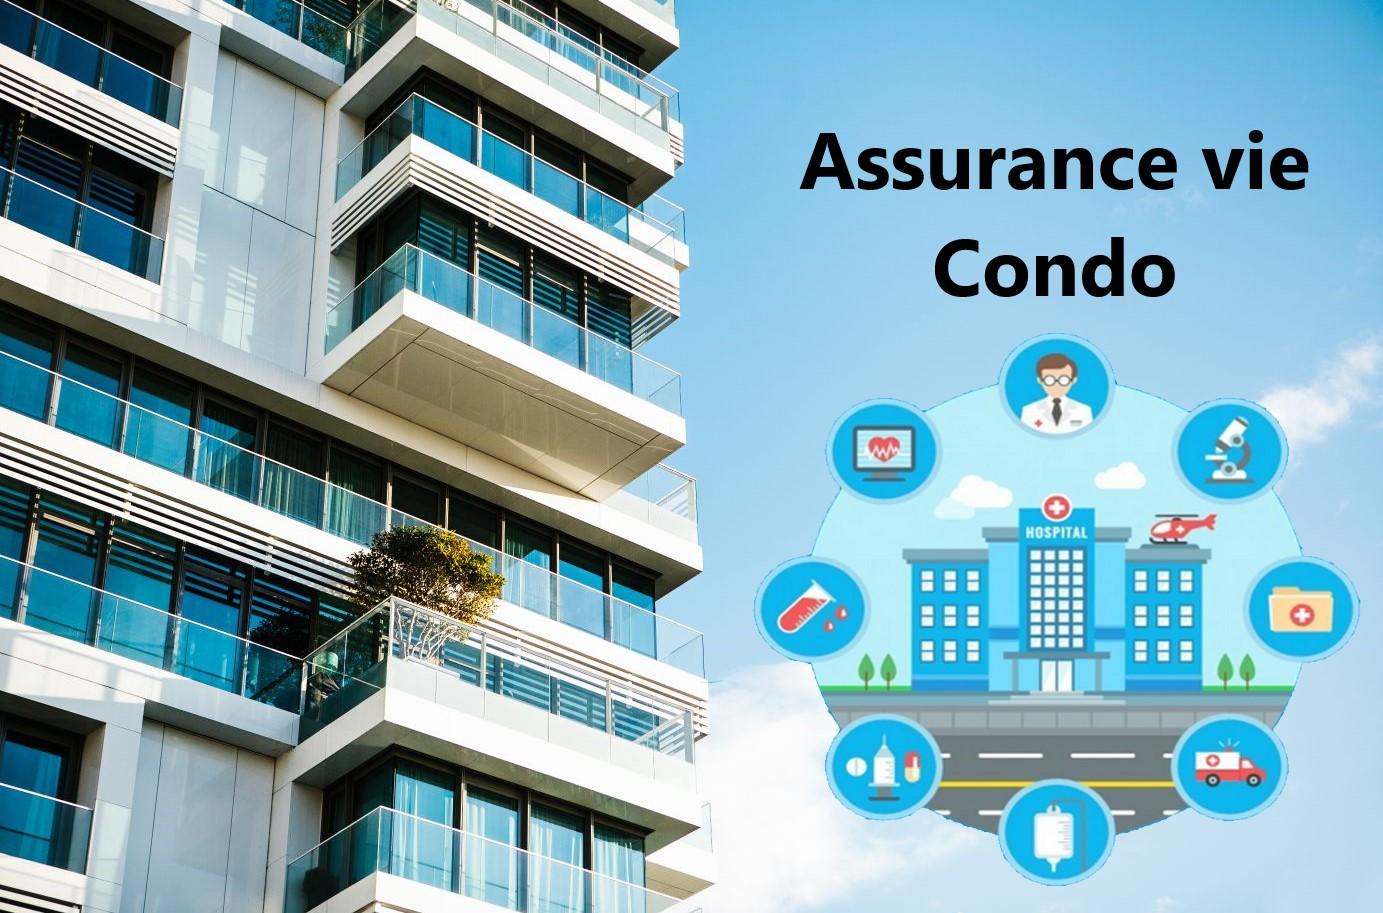 assurance vie condo